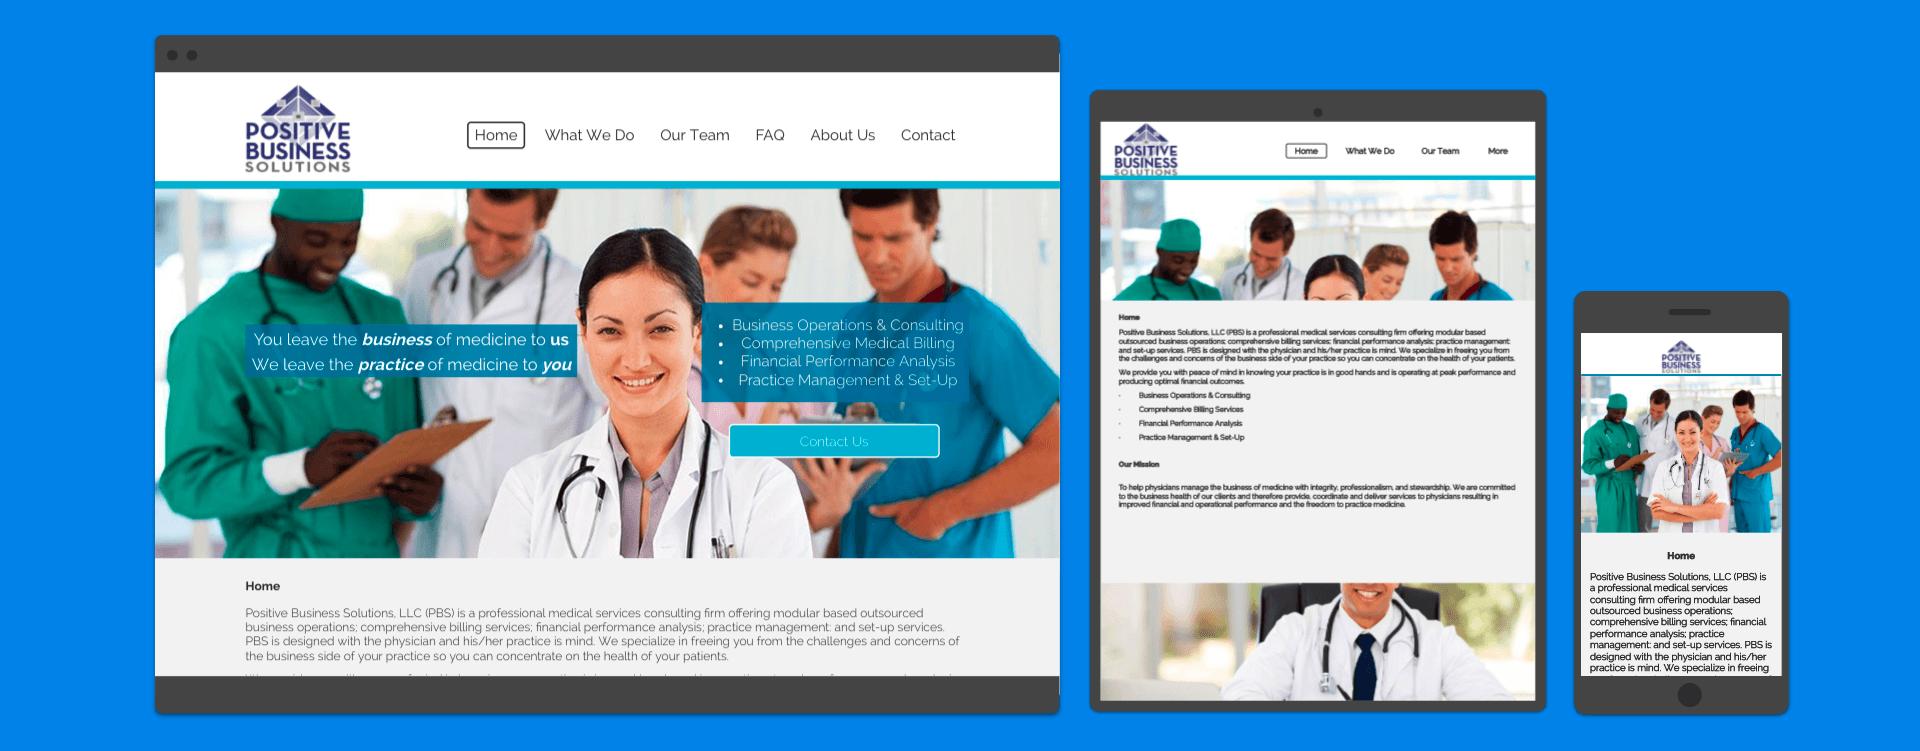 Web Development Portfolio - Medical Billing